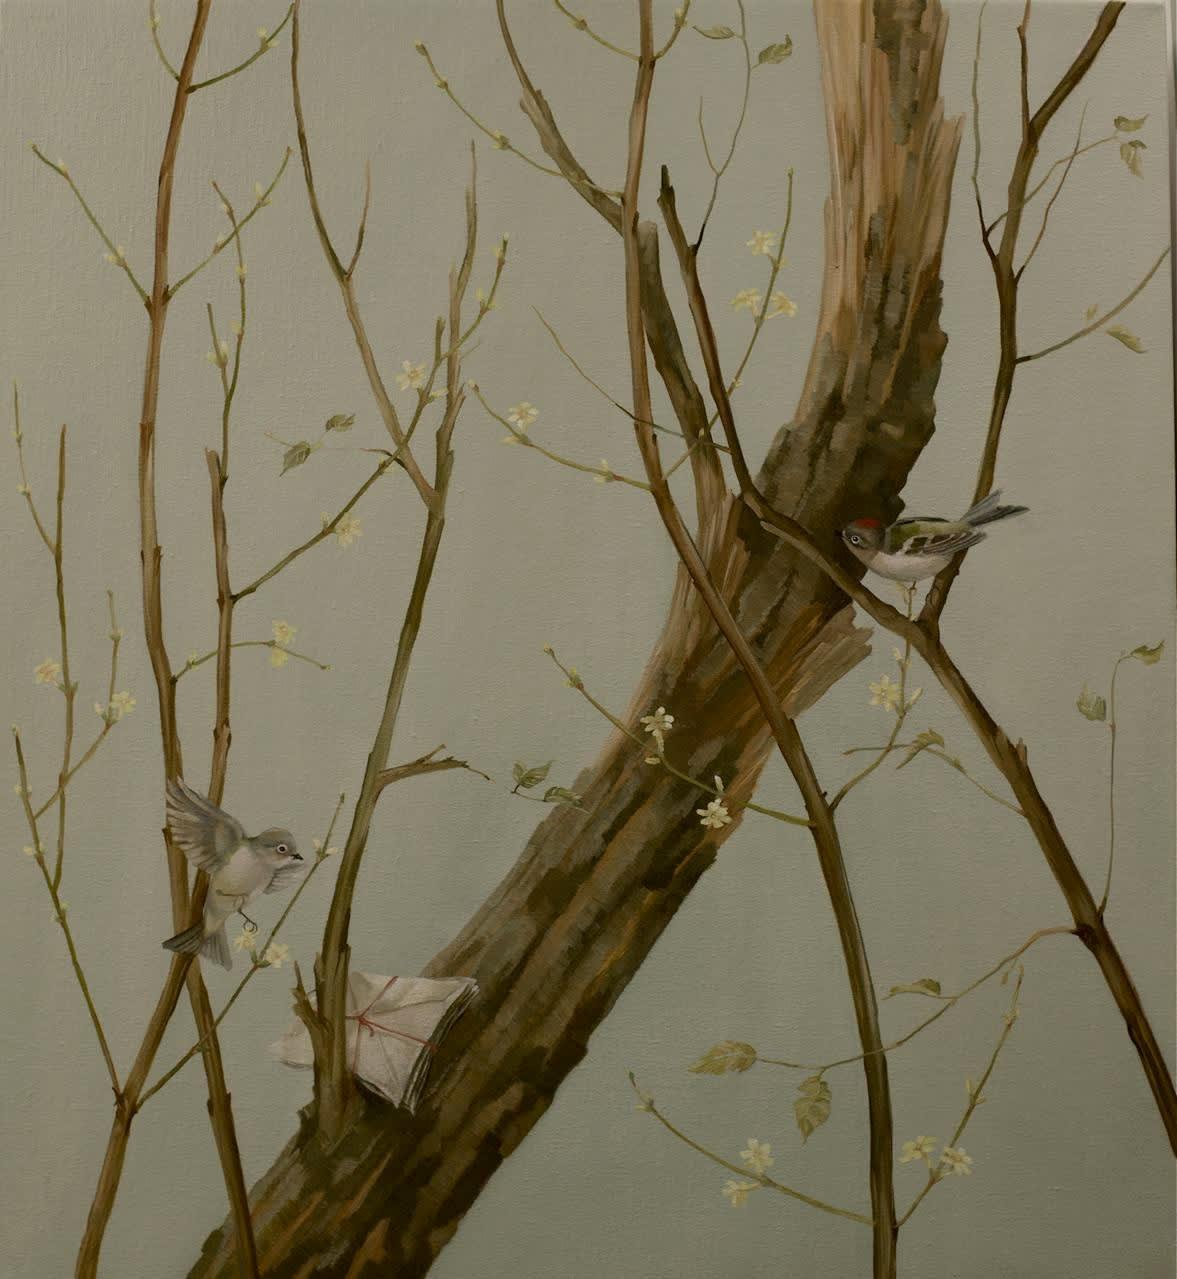 Grace O'Connor Kinglets, 2009 Oil on Linen 61 x 55.9 cm 24 x 22 in